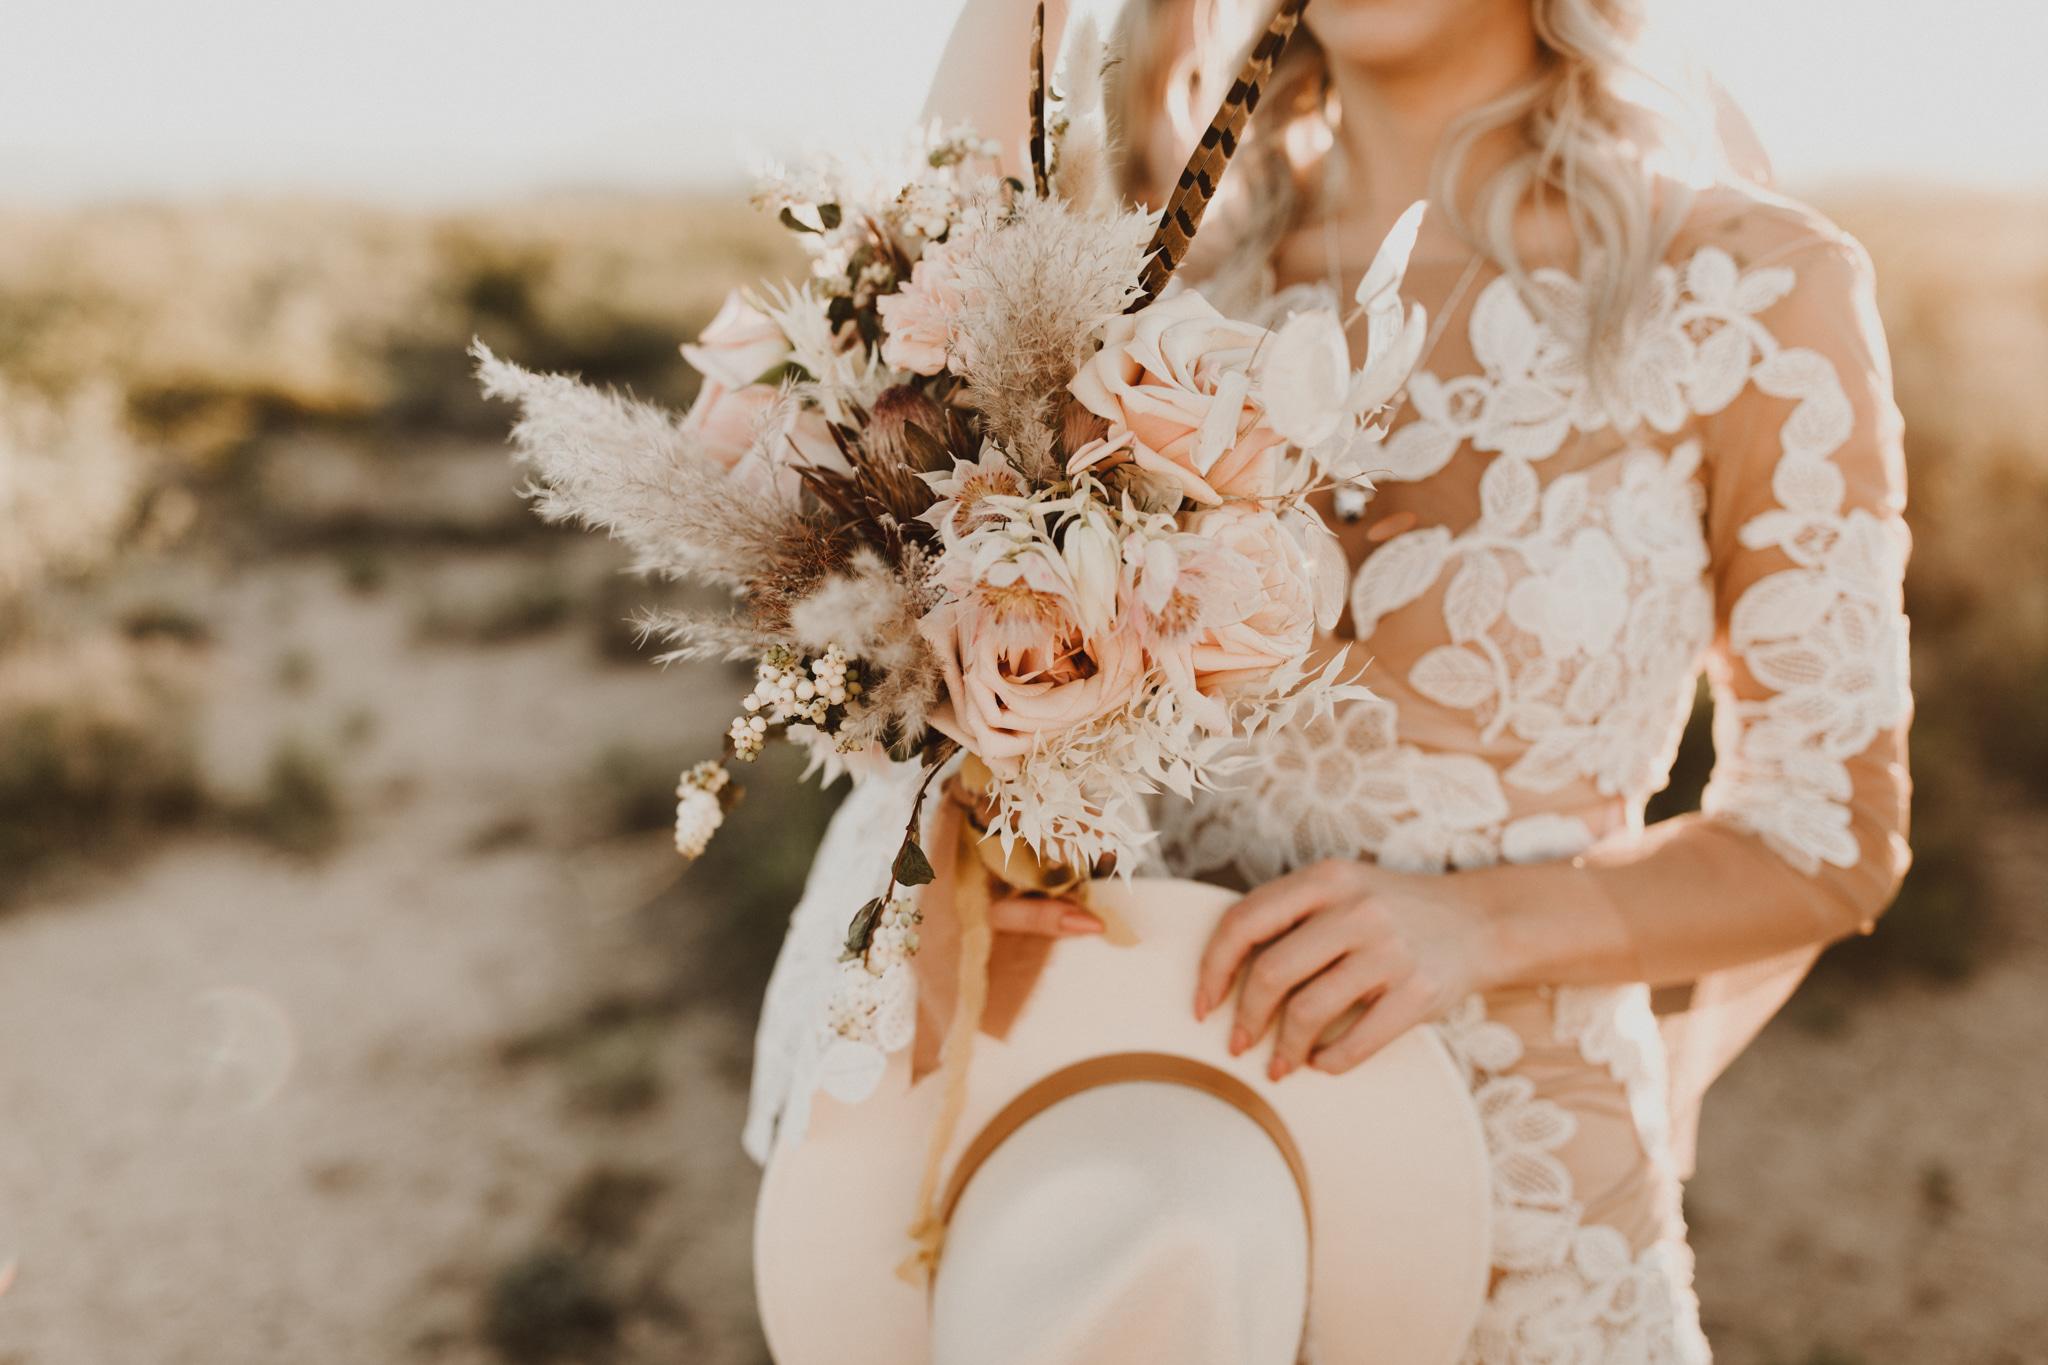 Photographer:  Valerie Thompson  Model: J illian Lyle  Dress:  Lovely bride  x  Lovers Society  Styling:  Laren Adams